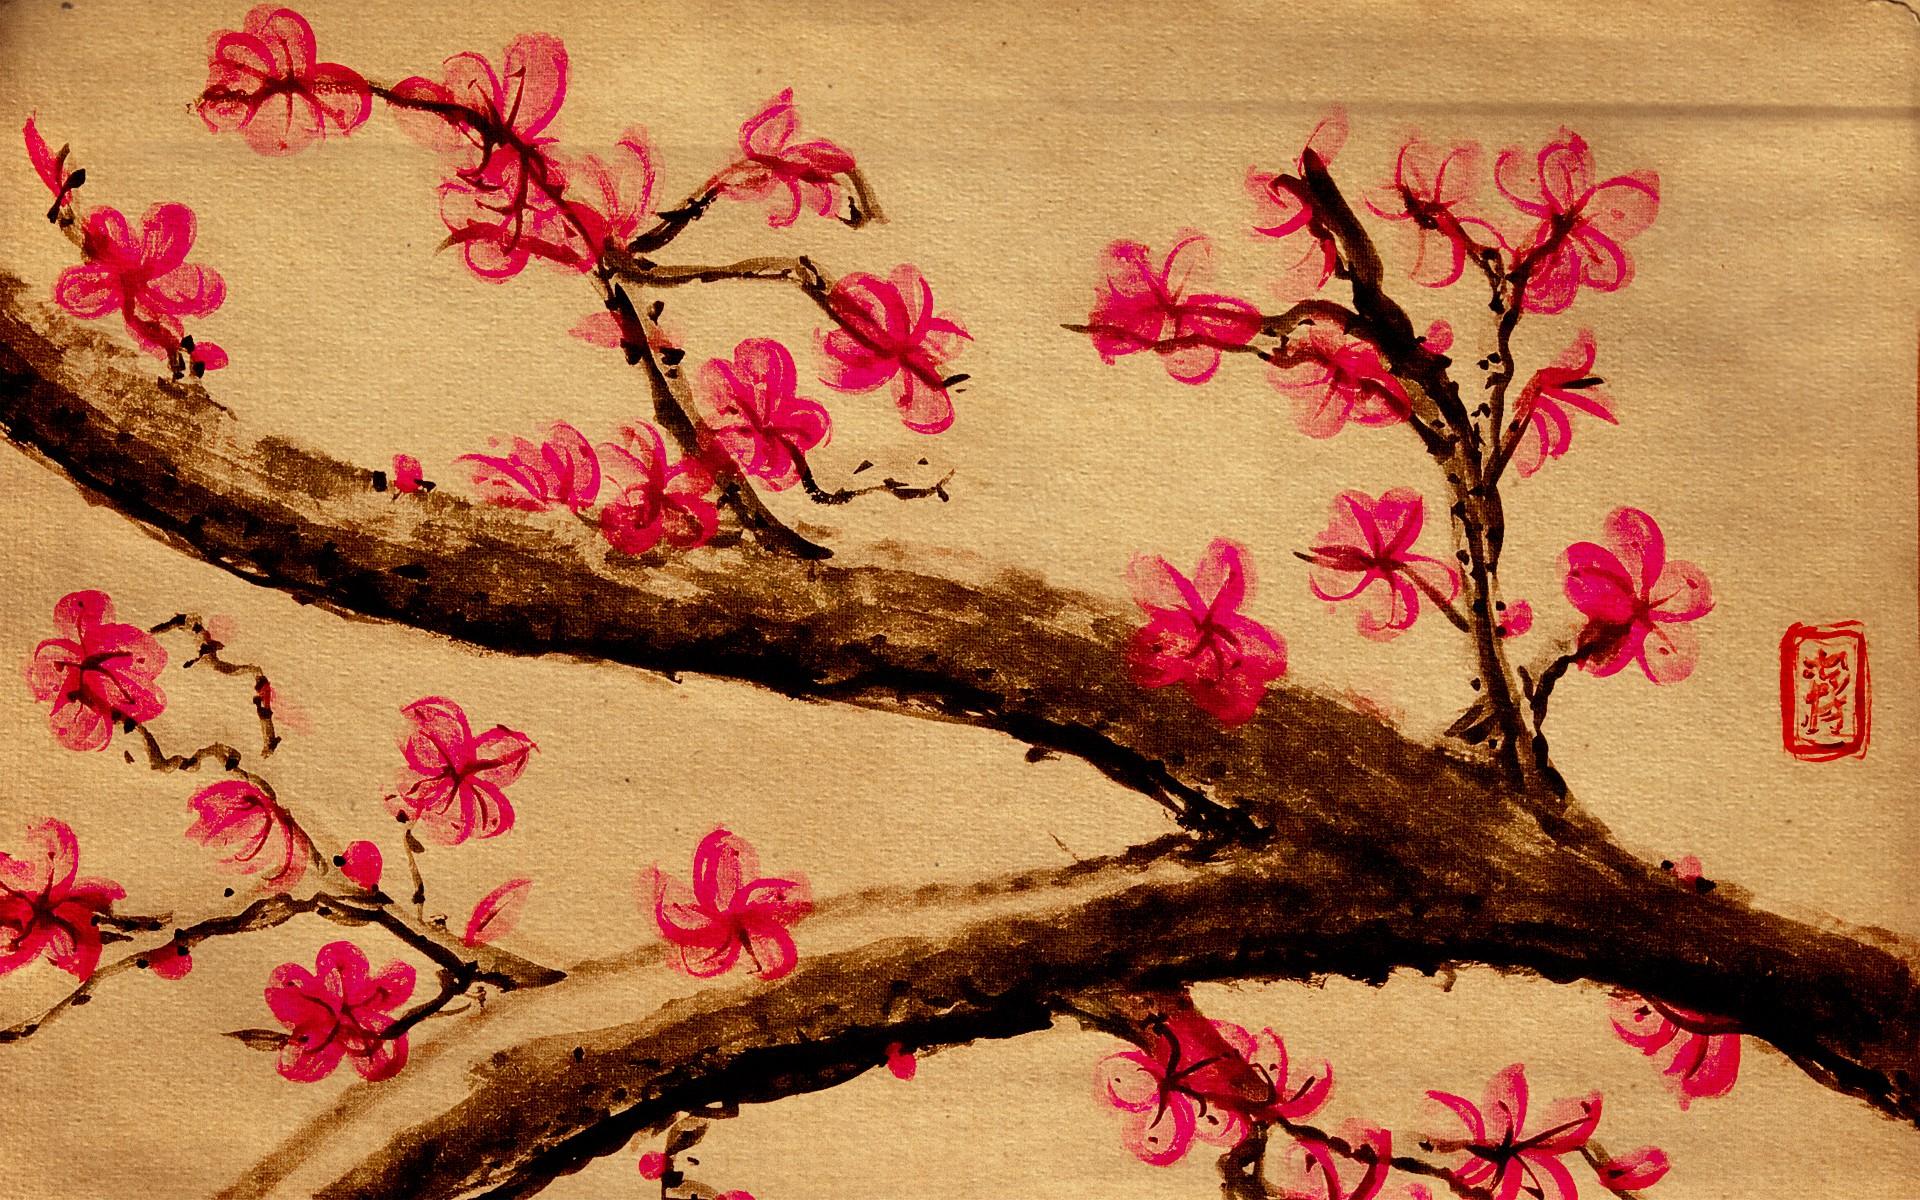 Fall Season Quotes Wallpapers Aesthetic Wallpapers Hd Pixelstalk Net